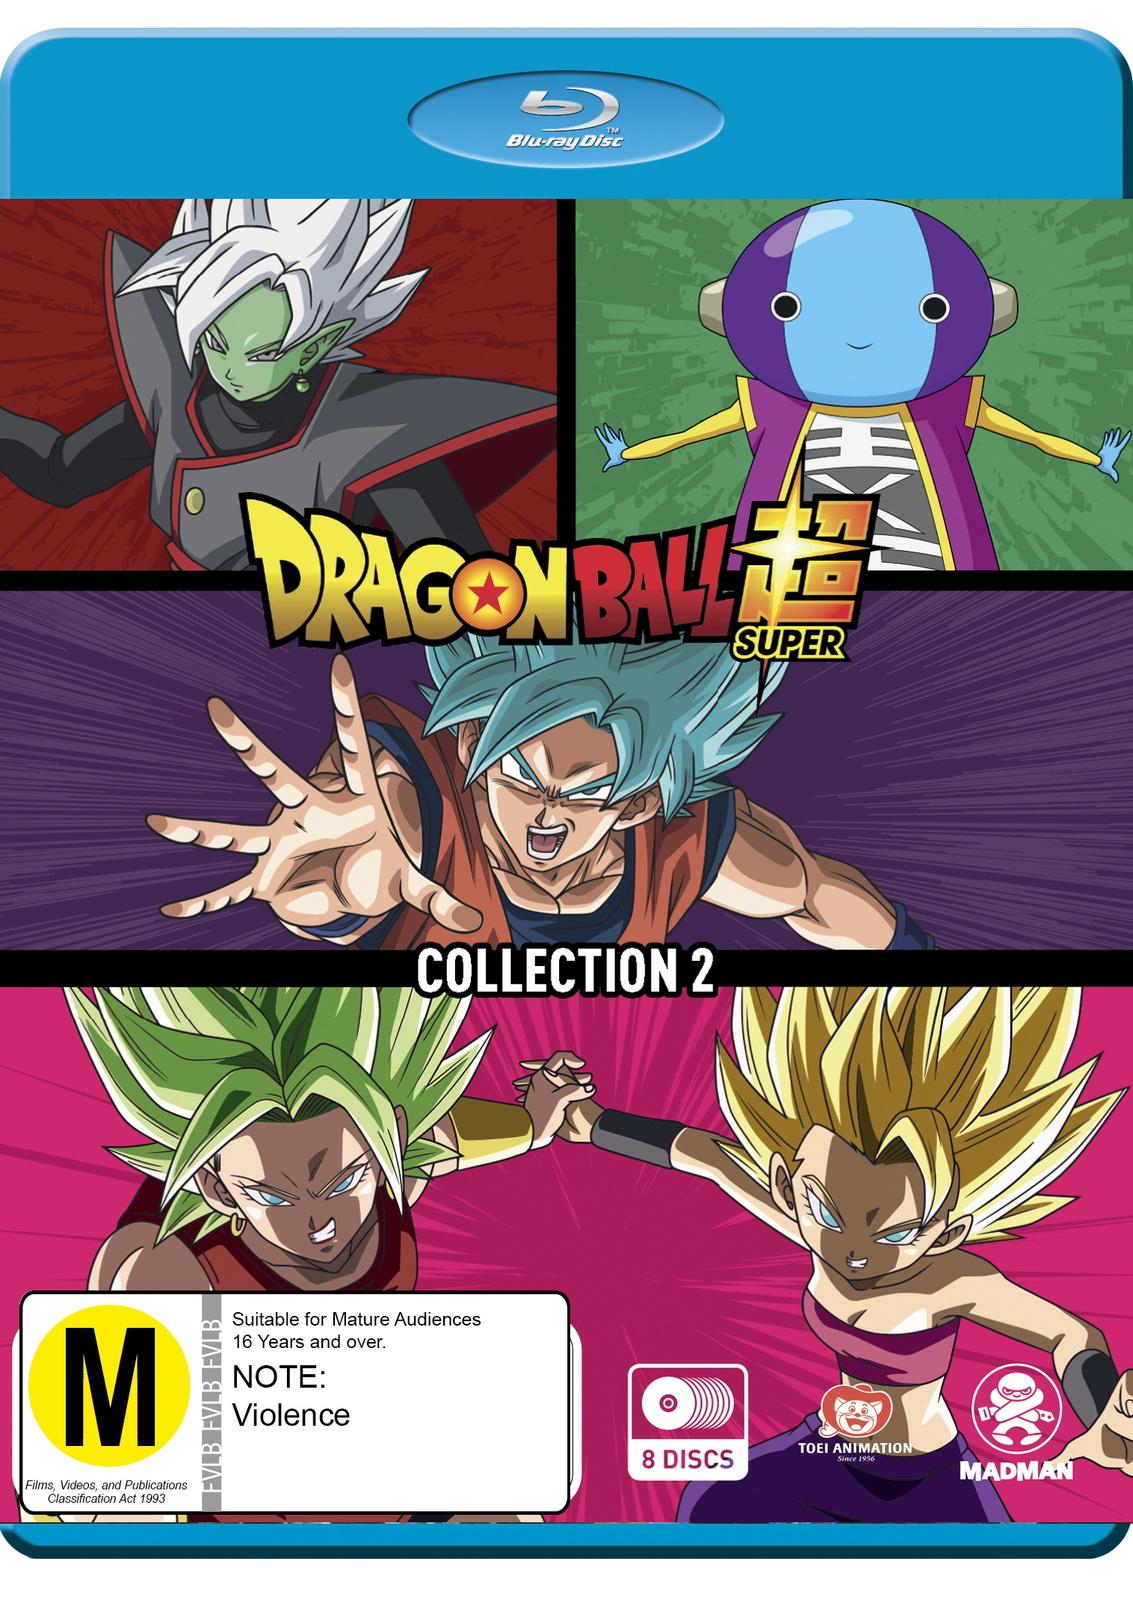 Dragon Ball Super - Collection 2 on Blu-ray image